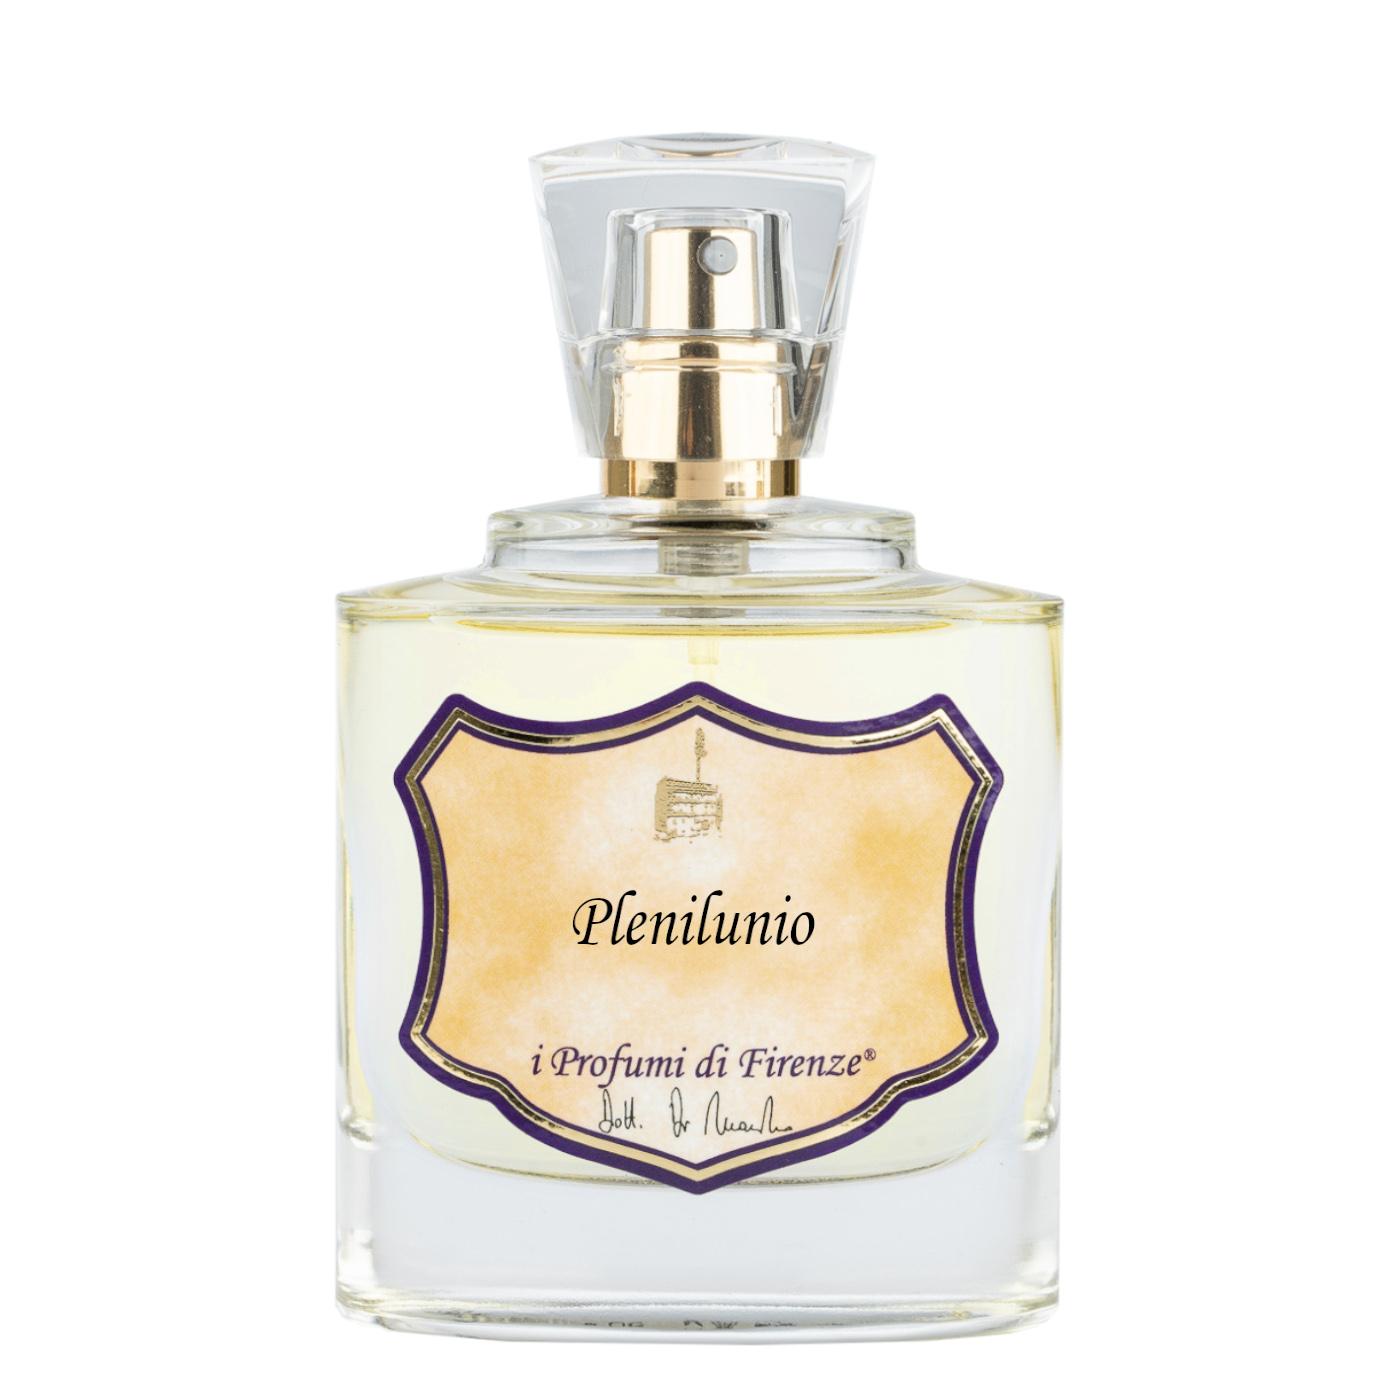 PLENILUNIO - Eau de Parfum-0